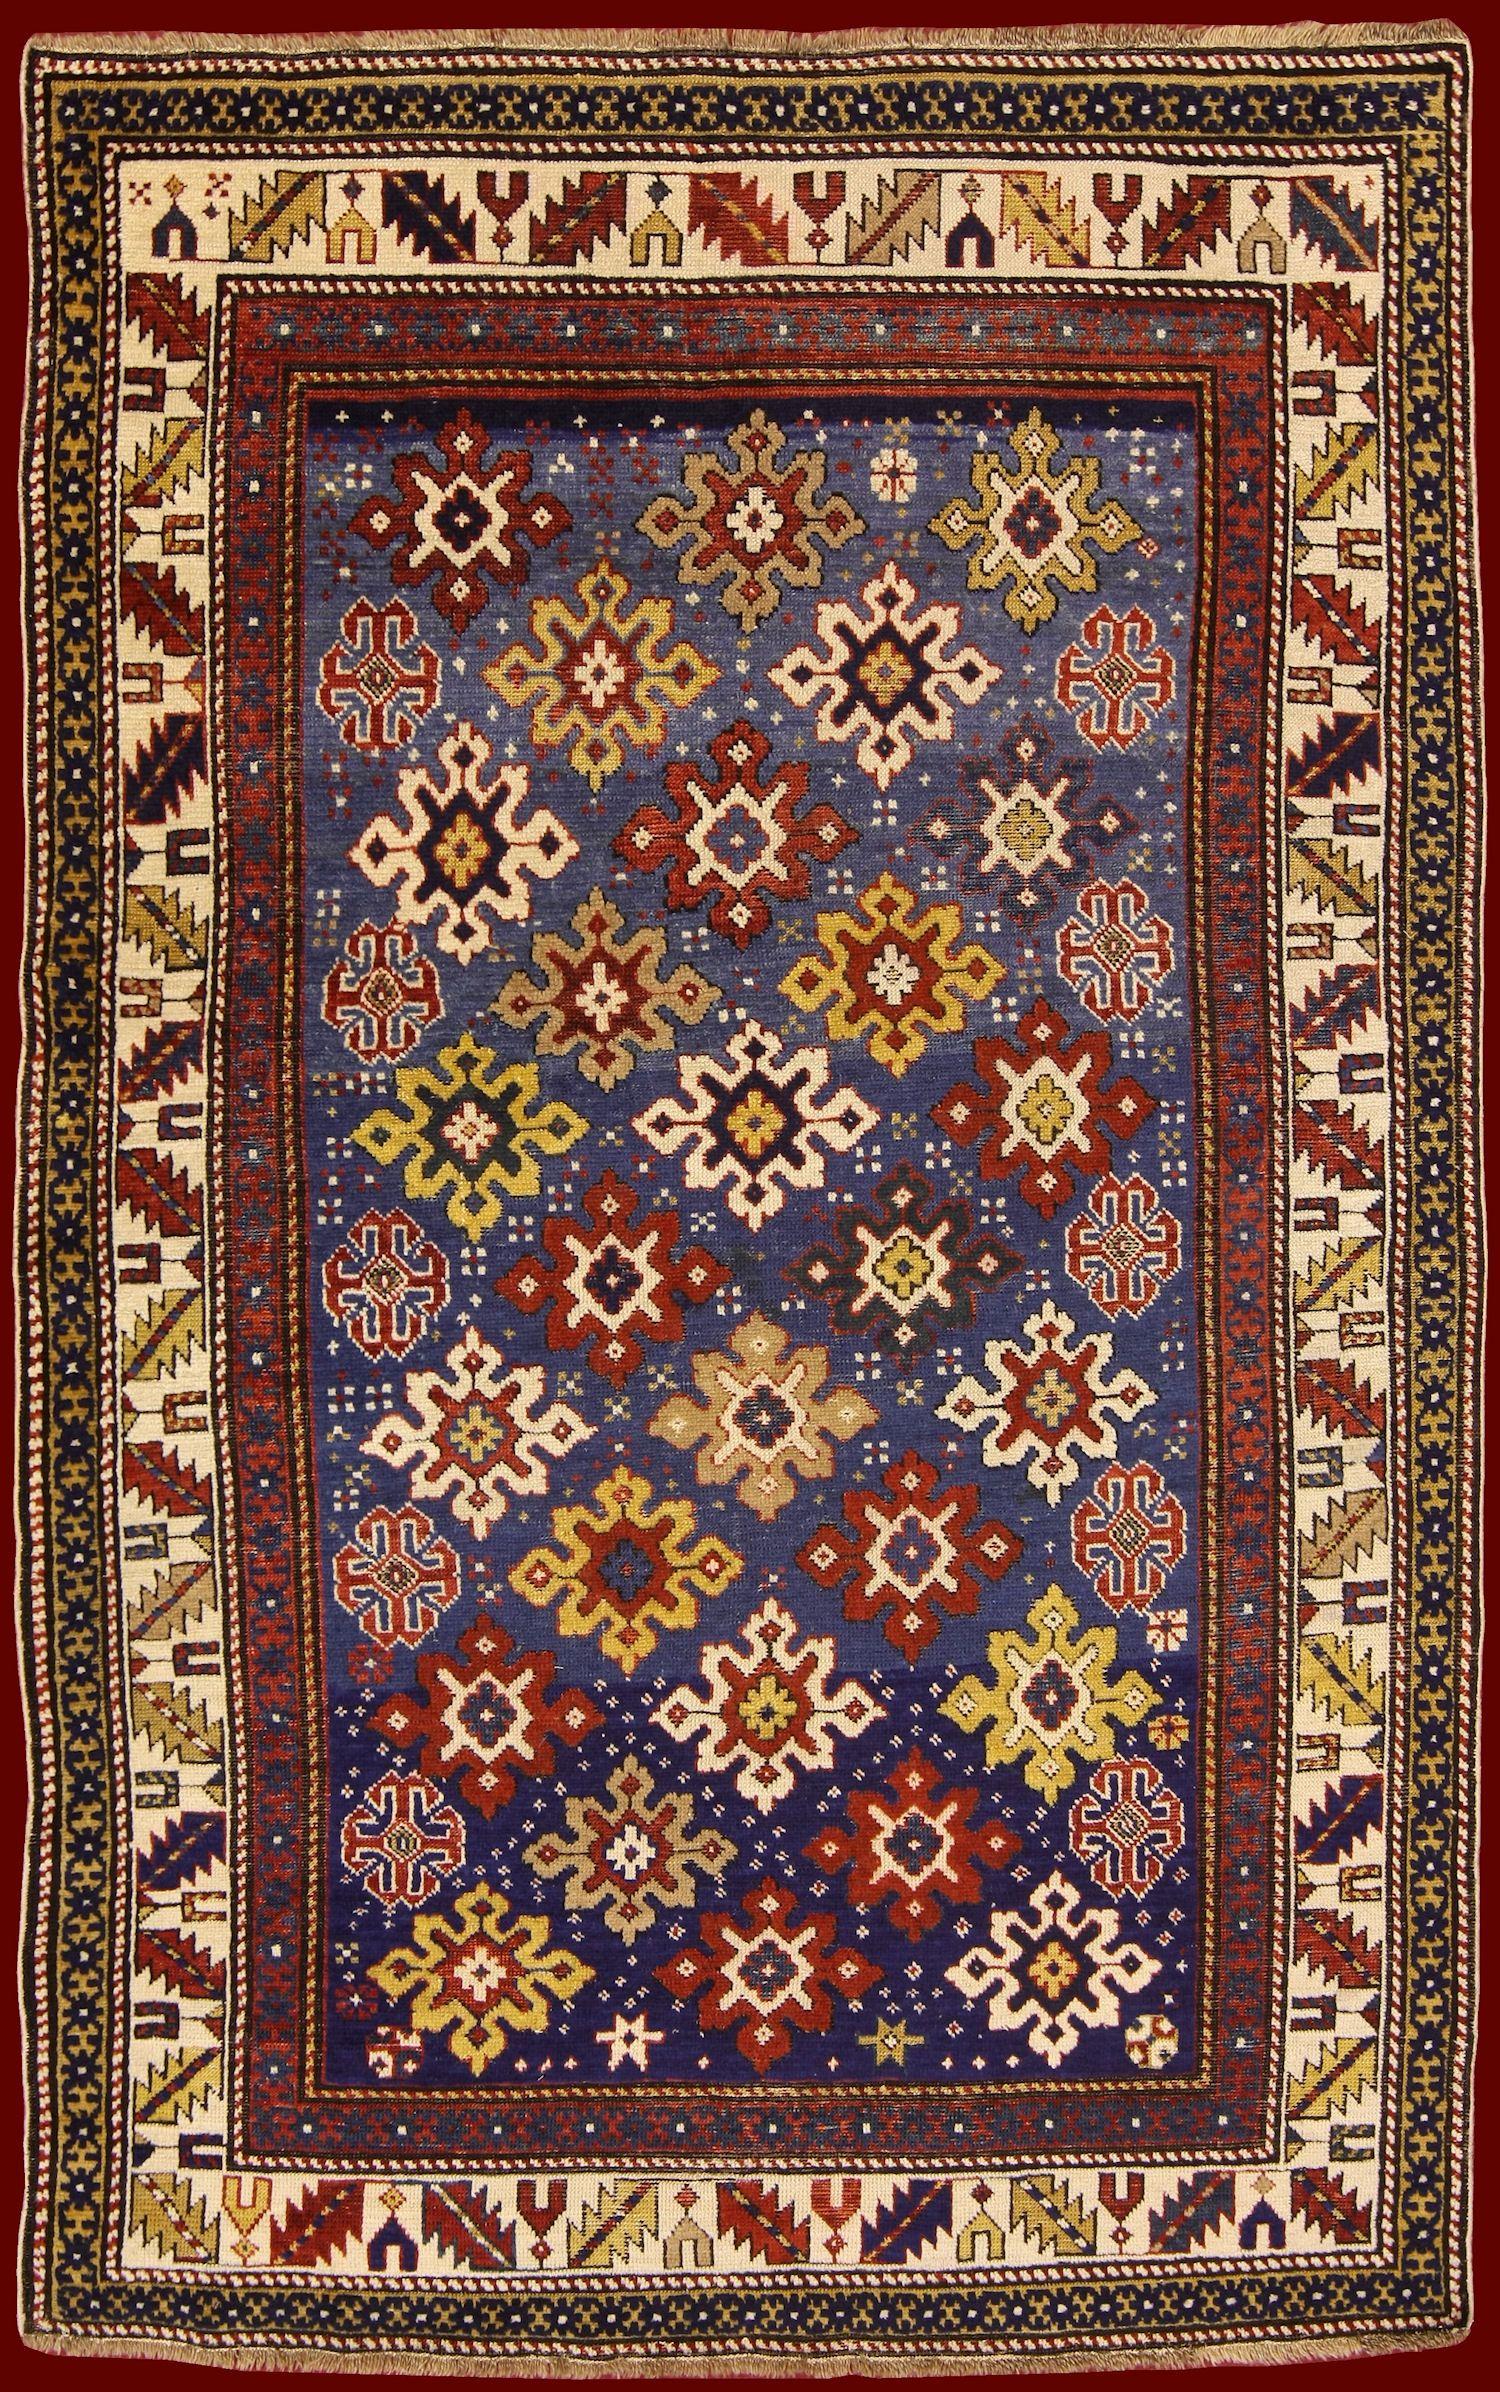 SHIRVAN RUG WITH STARS cm 171 x 110 Tappeti persiani